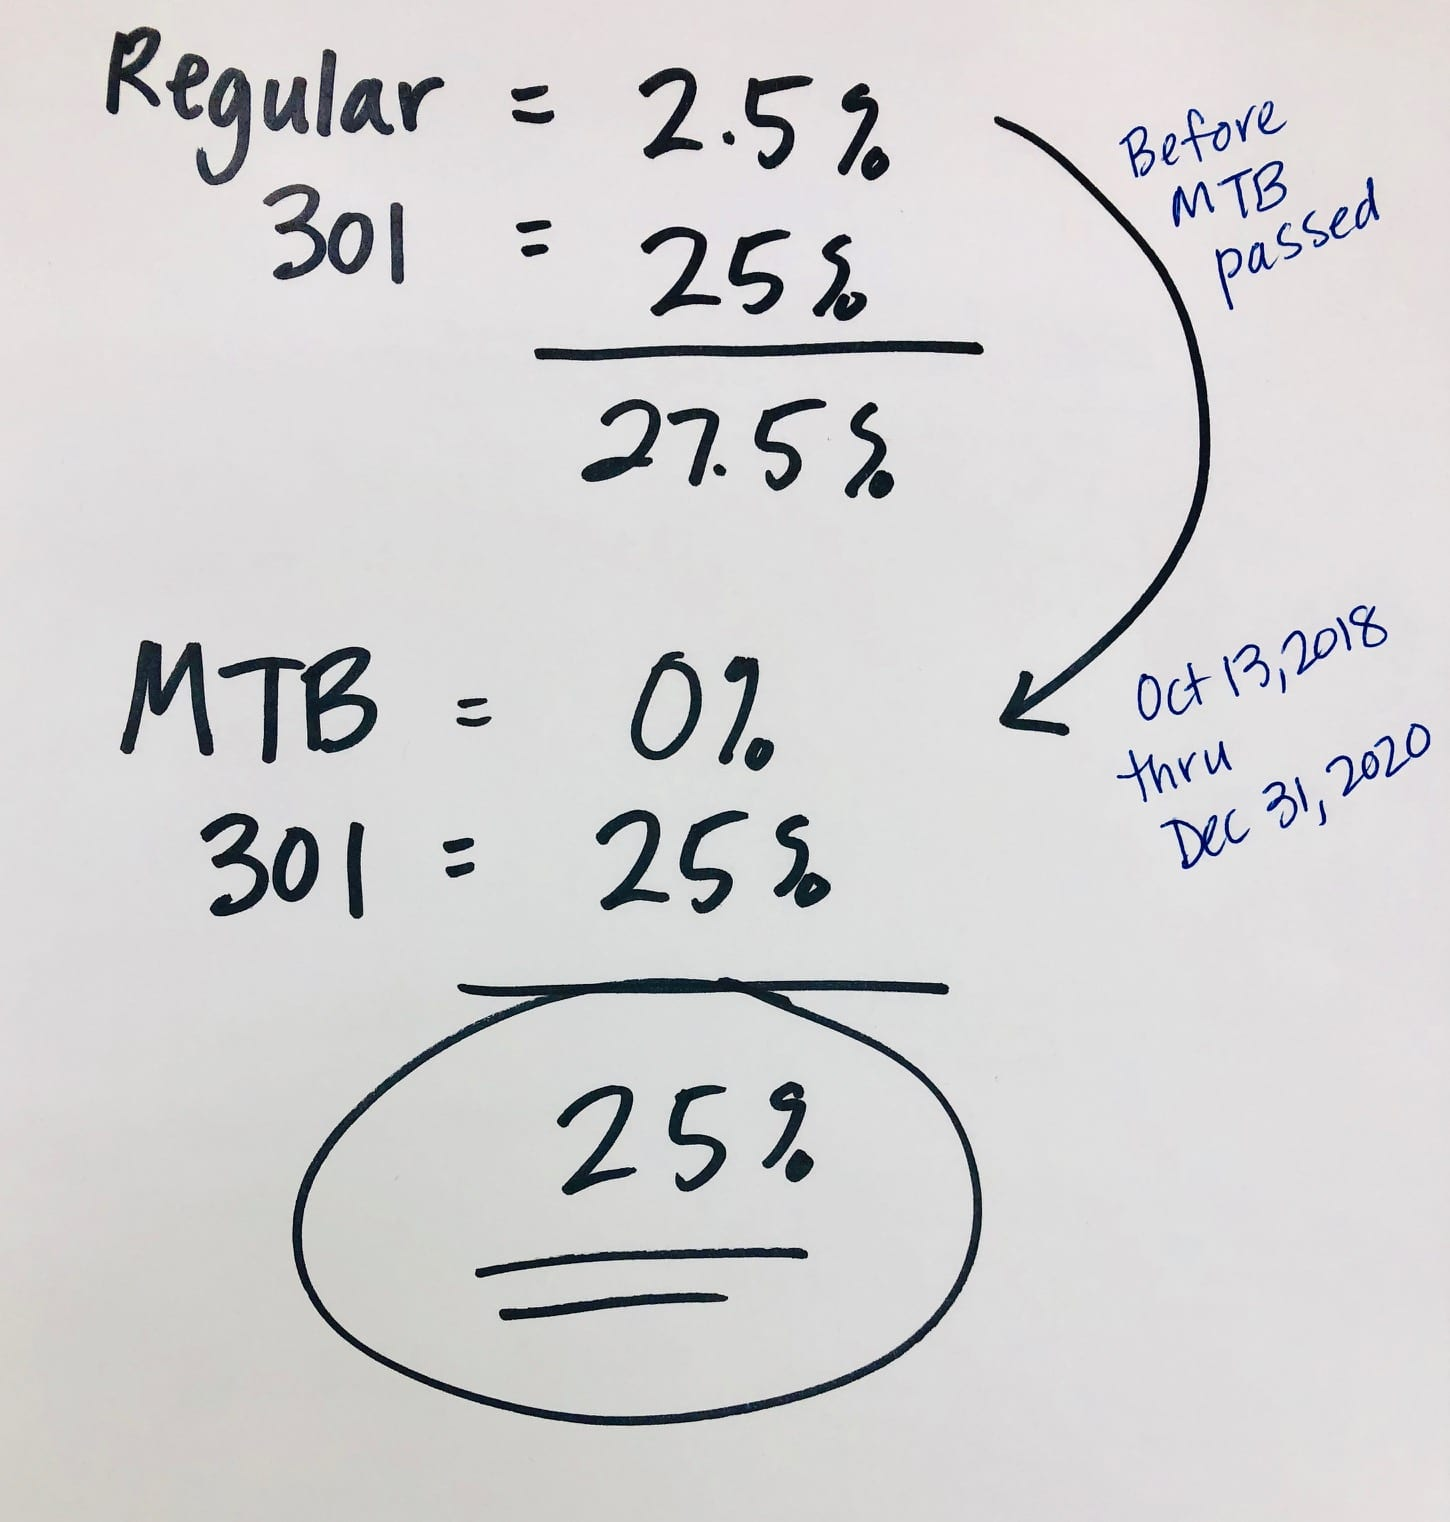 MTB Act Section 301 Tariff